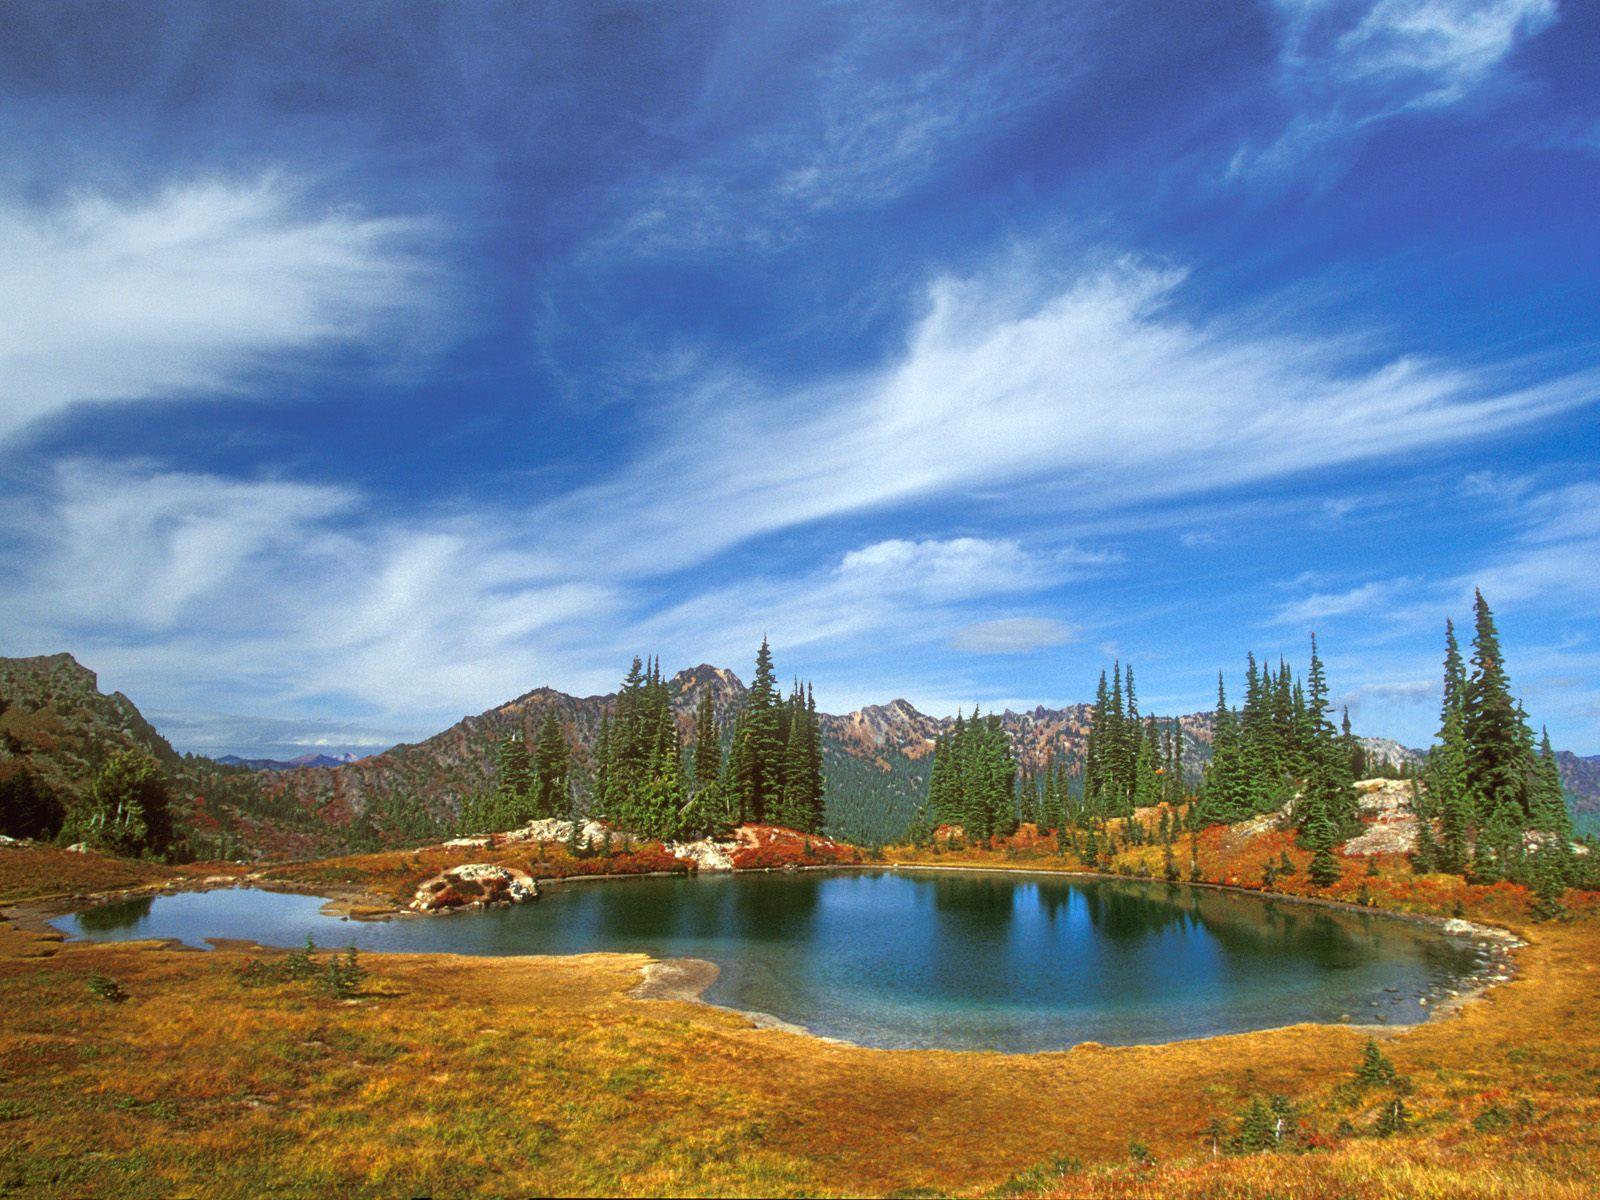 الجديد علي منتديات FOX3      صورHD The-Axis-of-Serenity_-Mount-Rainier-National-Park_-Washington